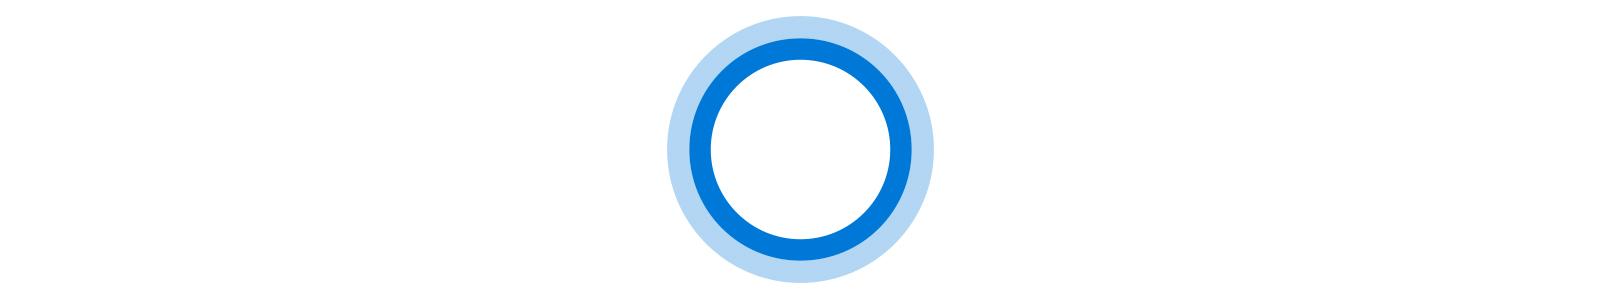 Animiertes Cortana-Symbol